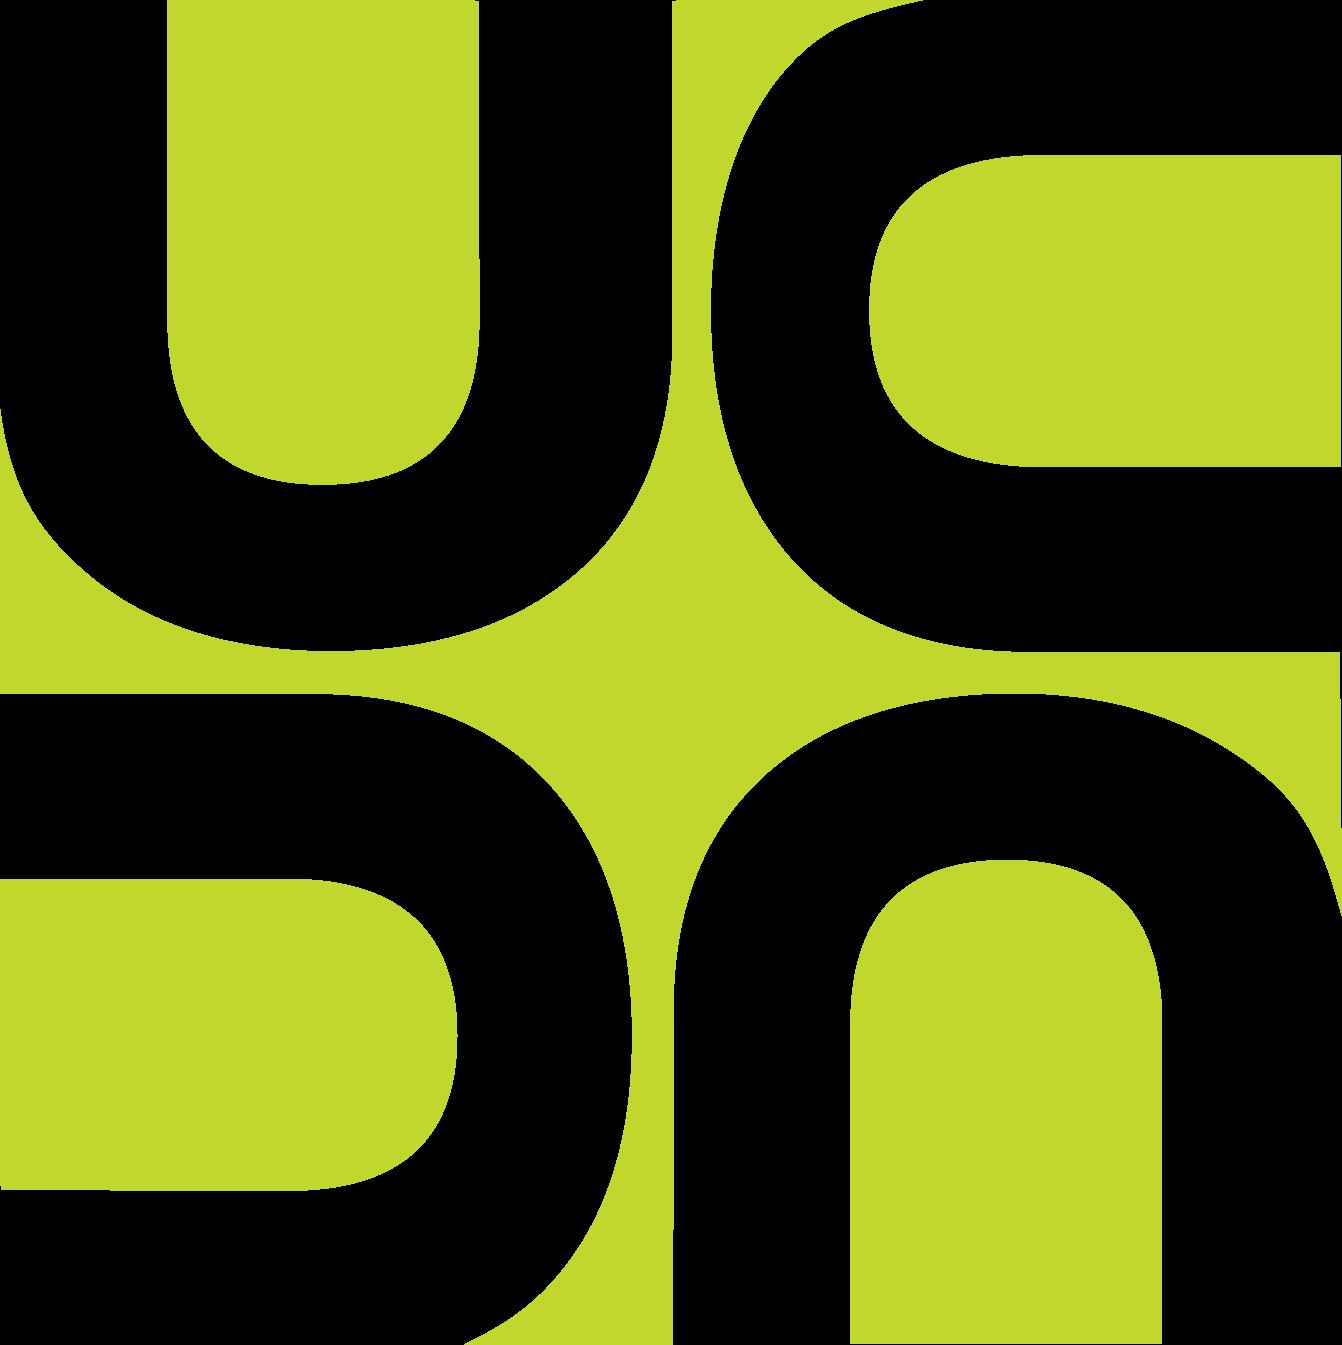 logo for UCDA